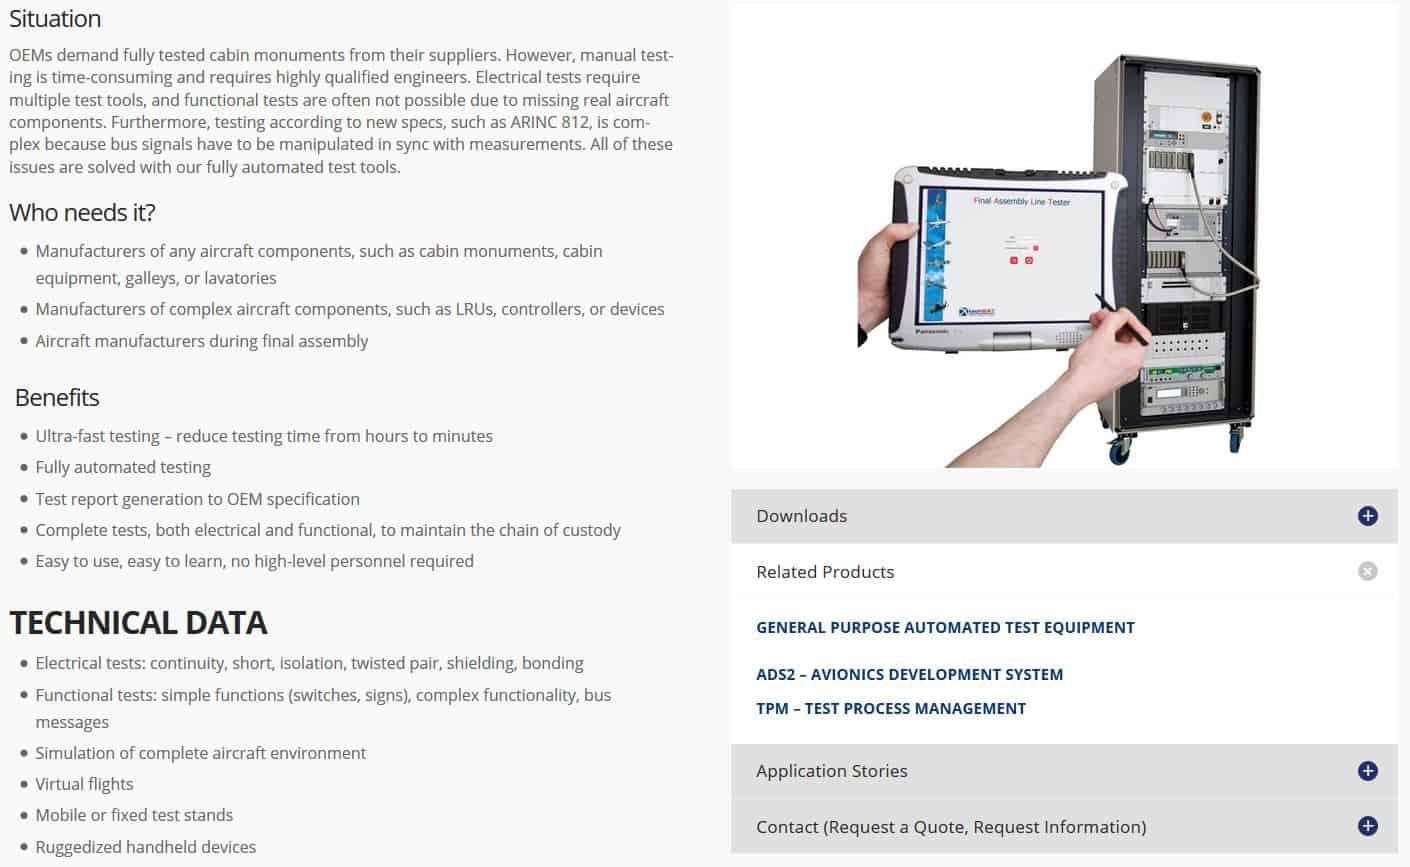 www.techsat.com TechSAT Poing products downloads